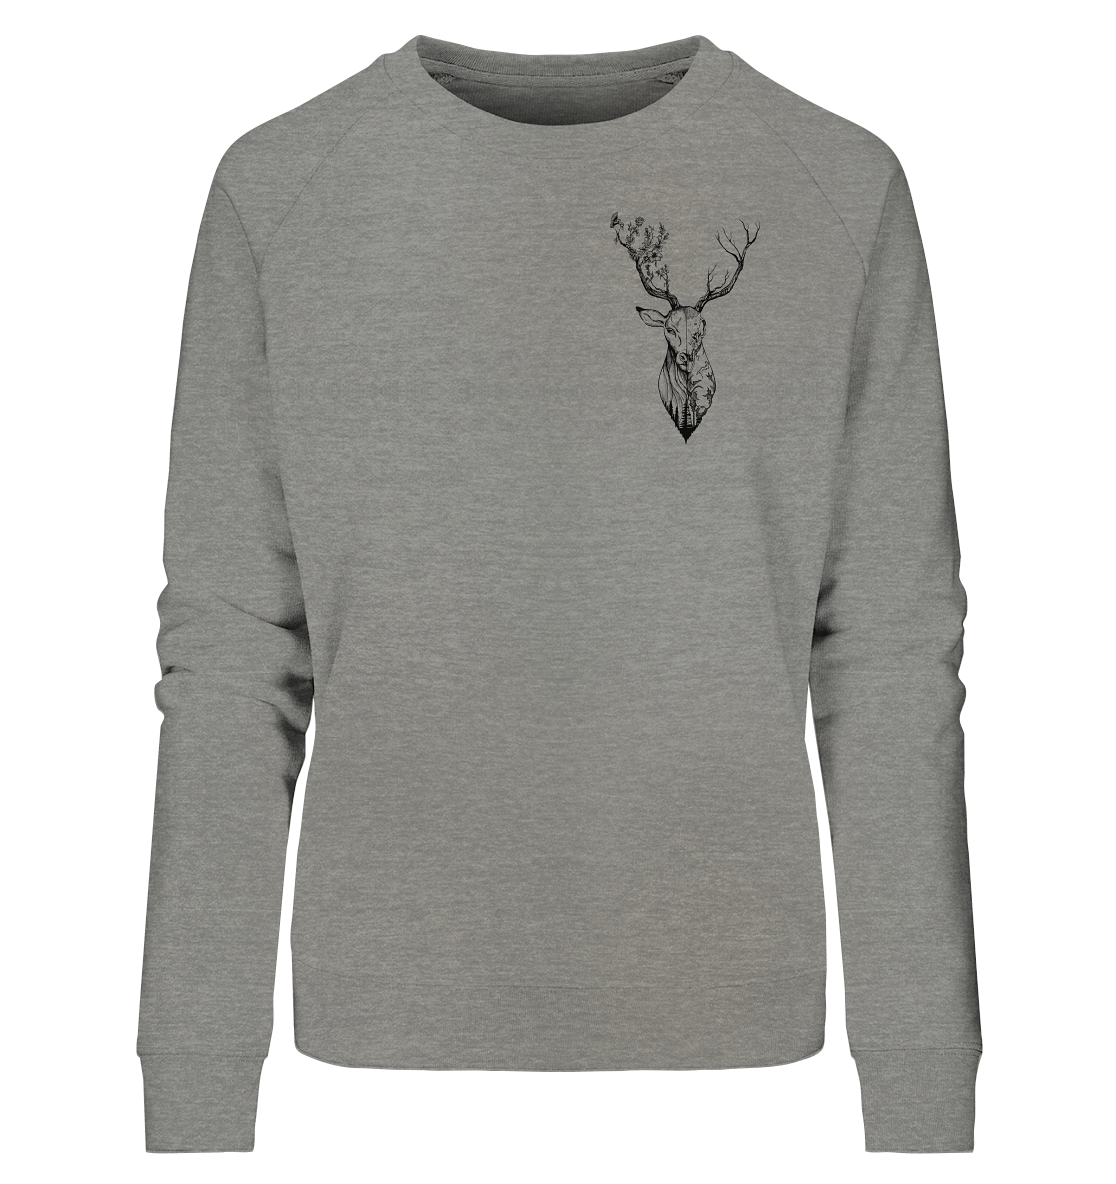 front-ladies-organic-sweatshirt-818381-1116x-13.png